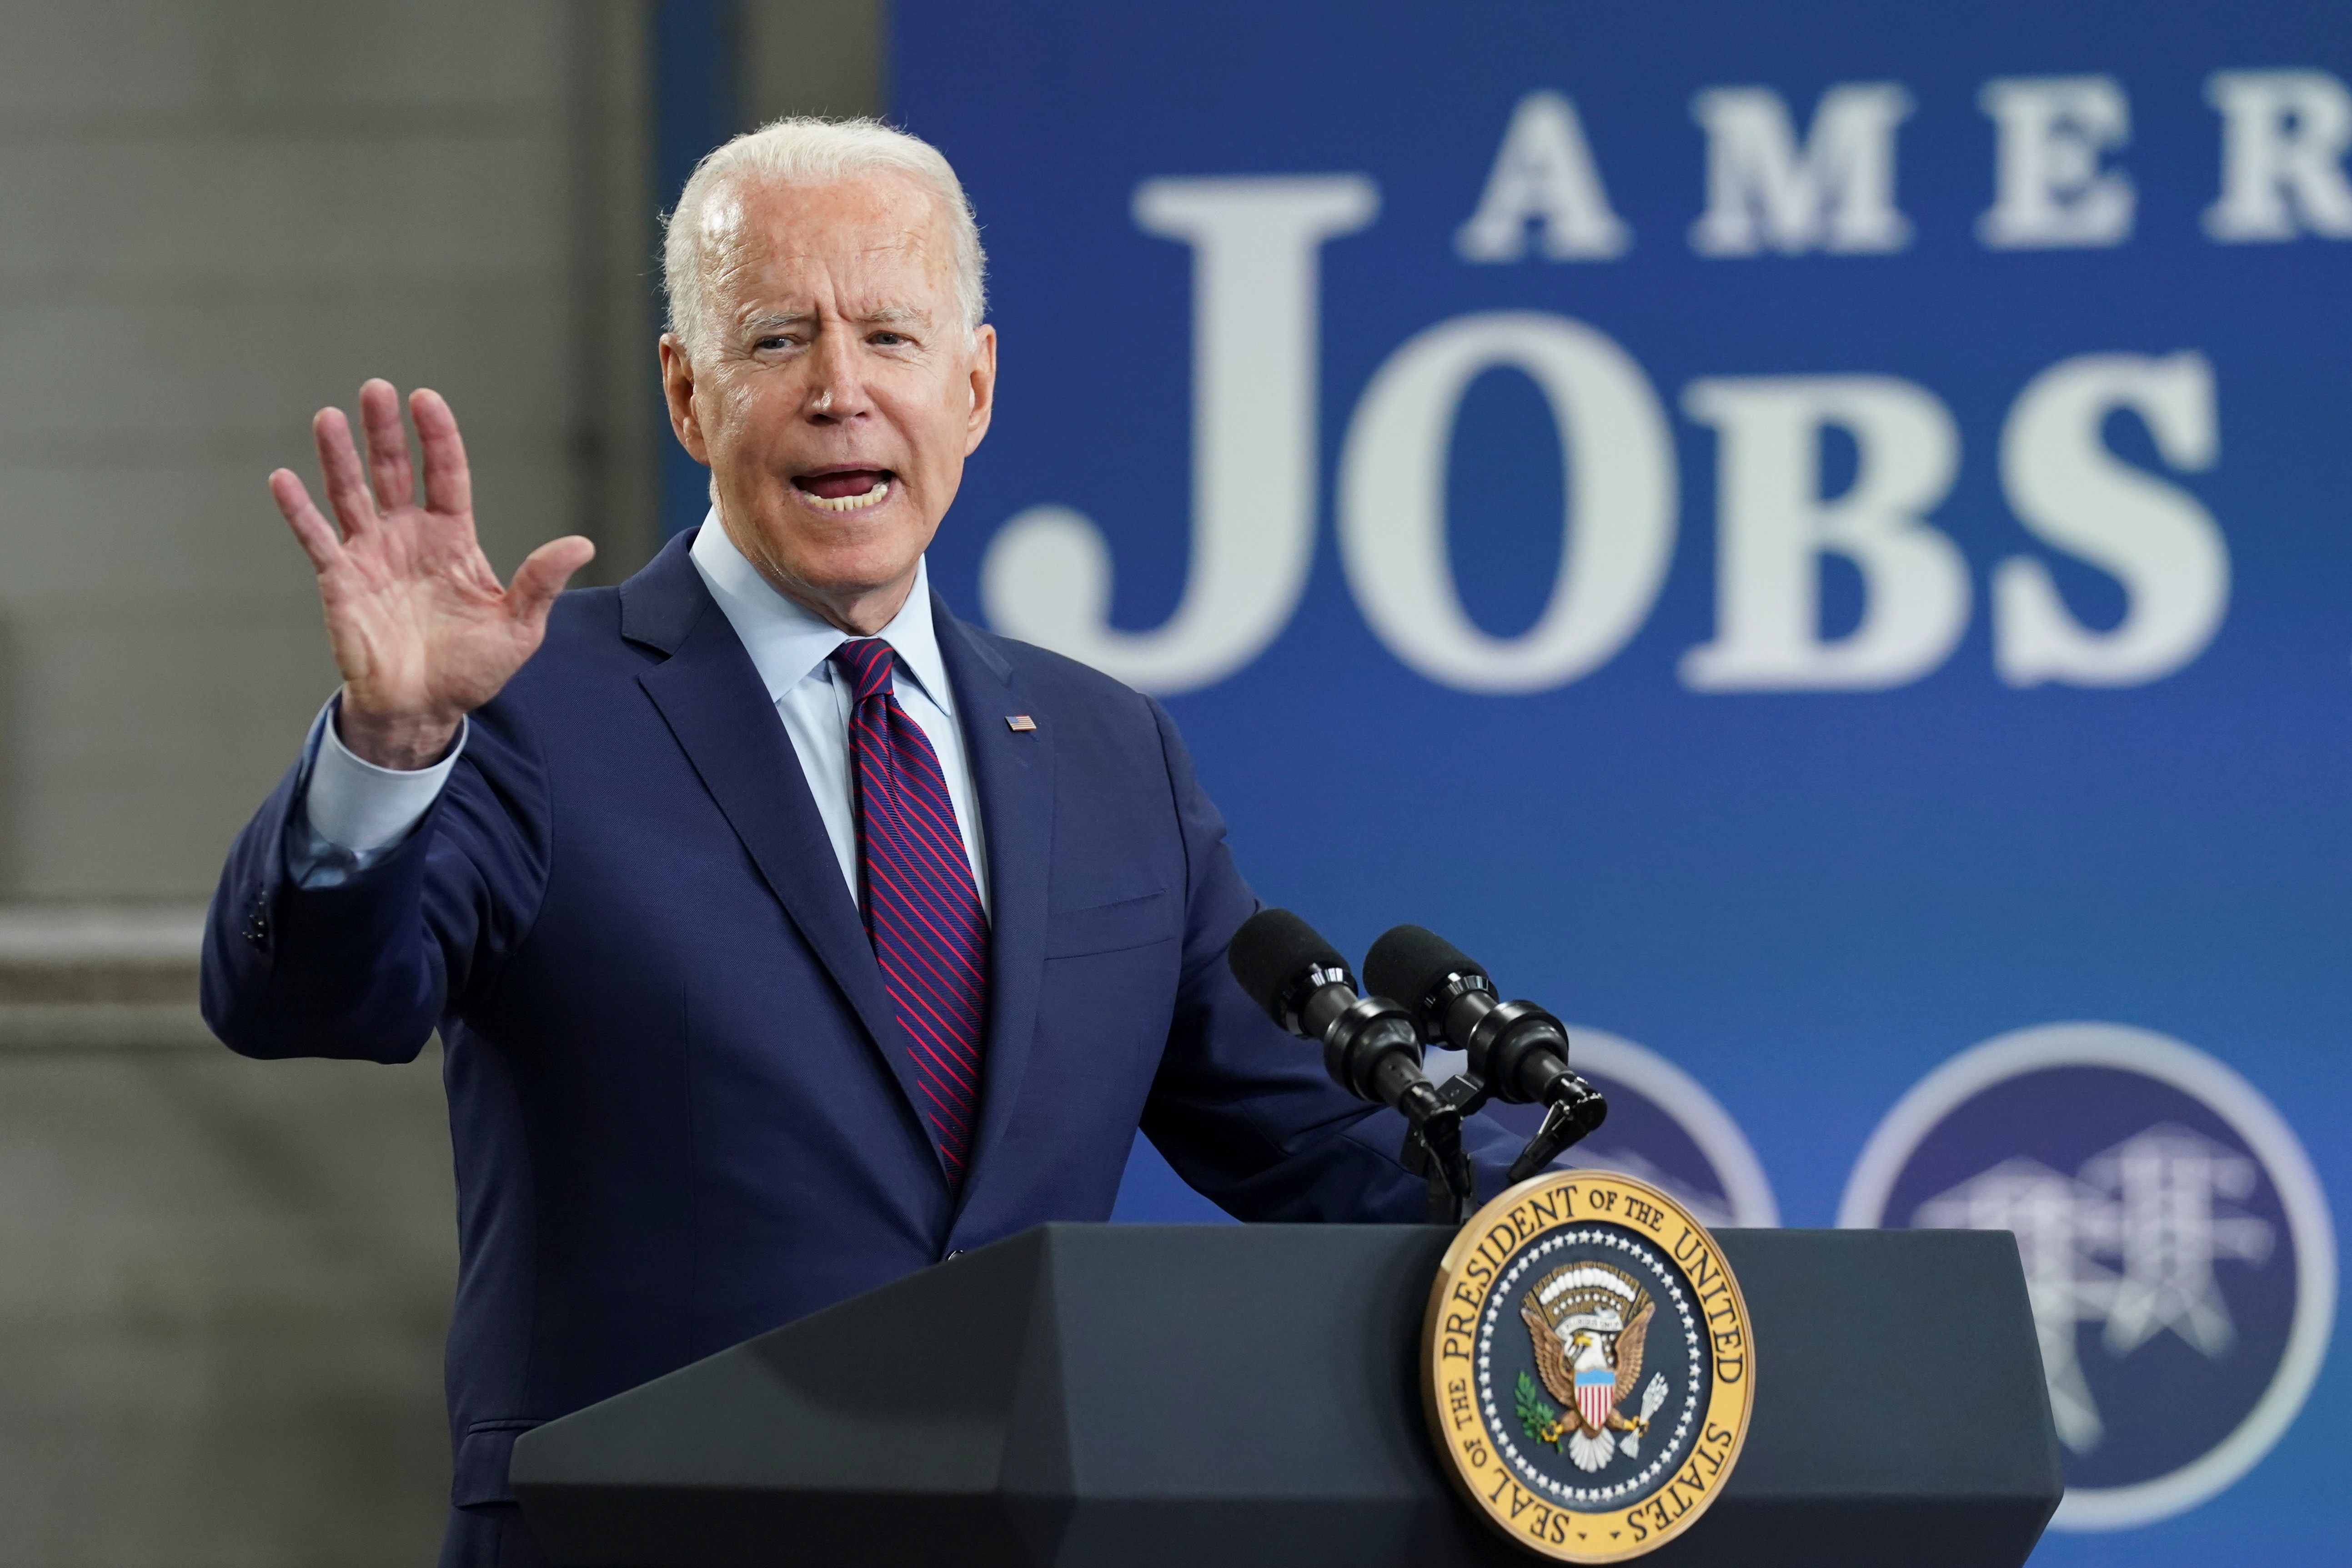 U.S. President Joe Biden delivers remarks highlighting the benefits of Bipartisan Infrastructure Framework, at La Crosse Municipal Transit Utility, in La Crosse, Wisconsin, U.S., June 29, 2021. REUTERS/Kevin Lamarque